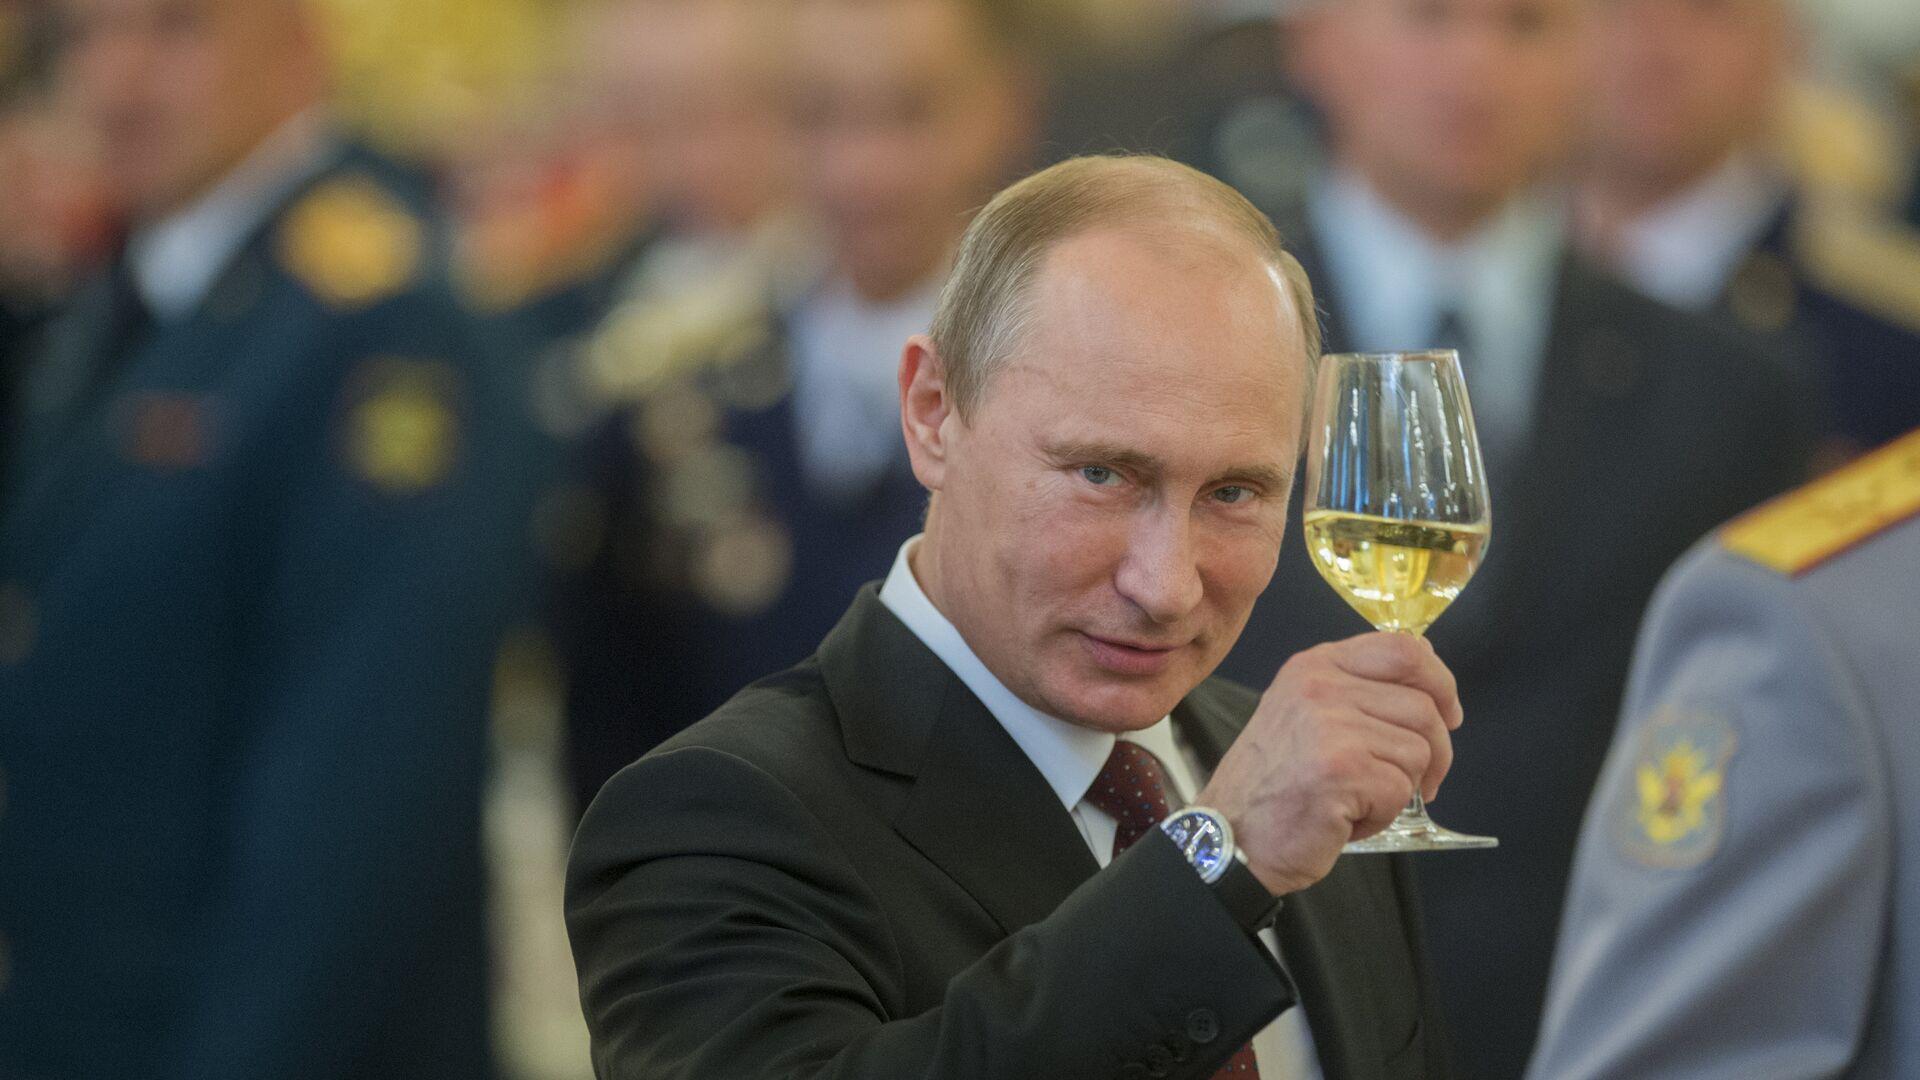 Putin z szampanem - Sputnik Polska, 1920, 09.10.2021